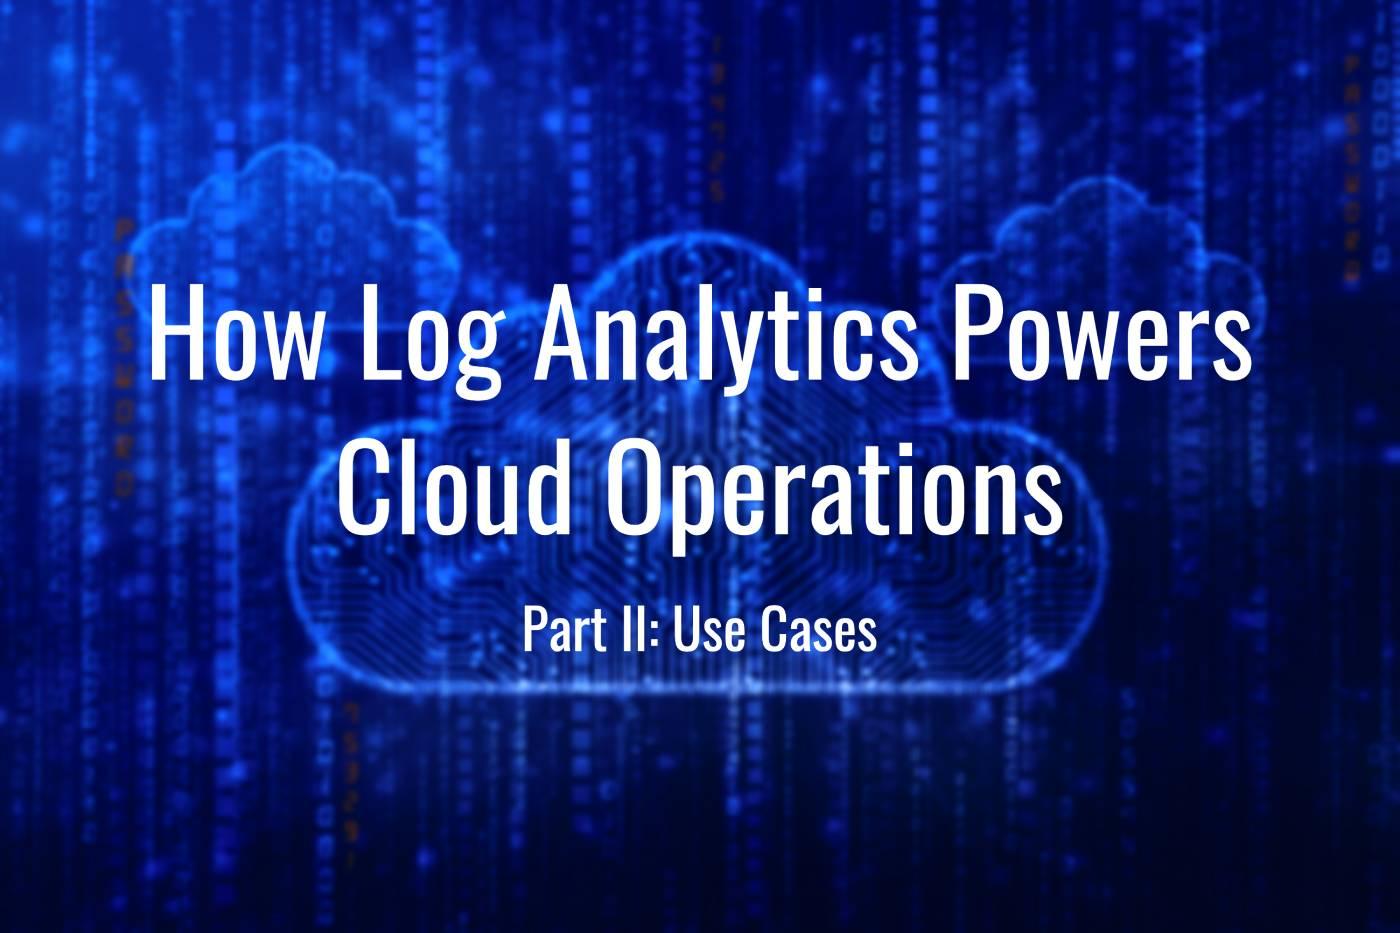 How Log Analytics Powers Cloud Operations